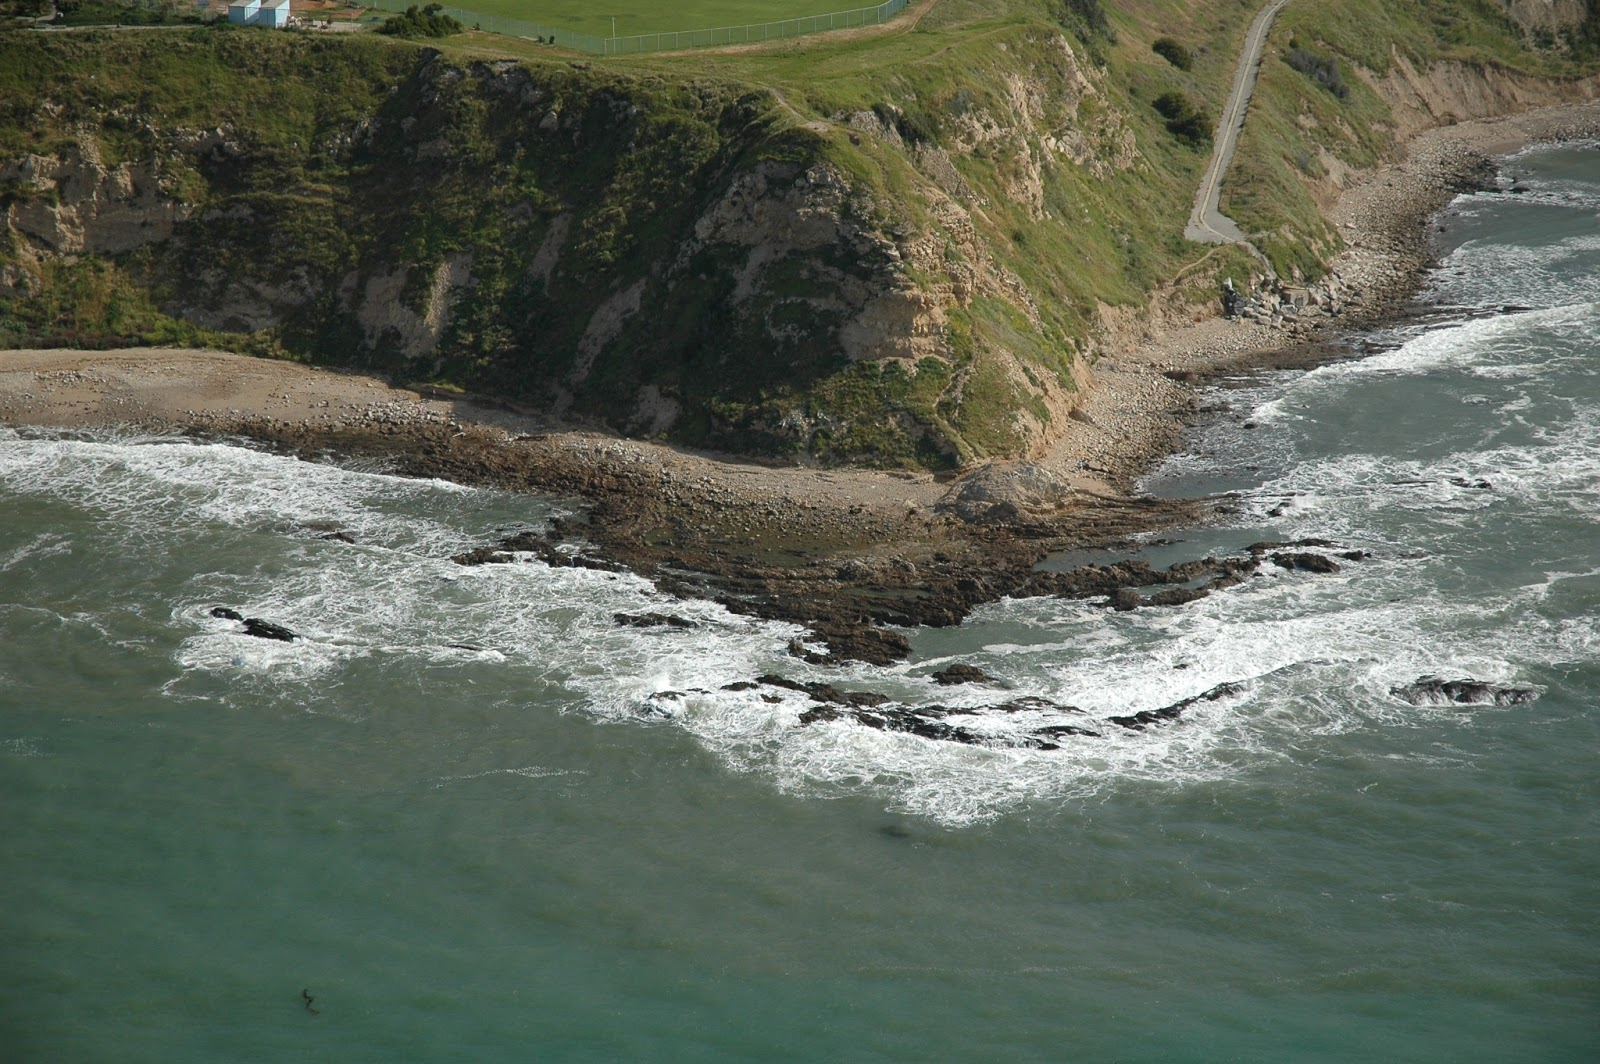 Landforms in the world coastal and oceanic landform 53 for Terrace landform